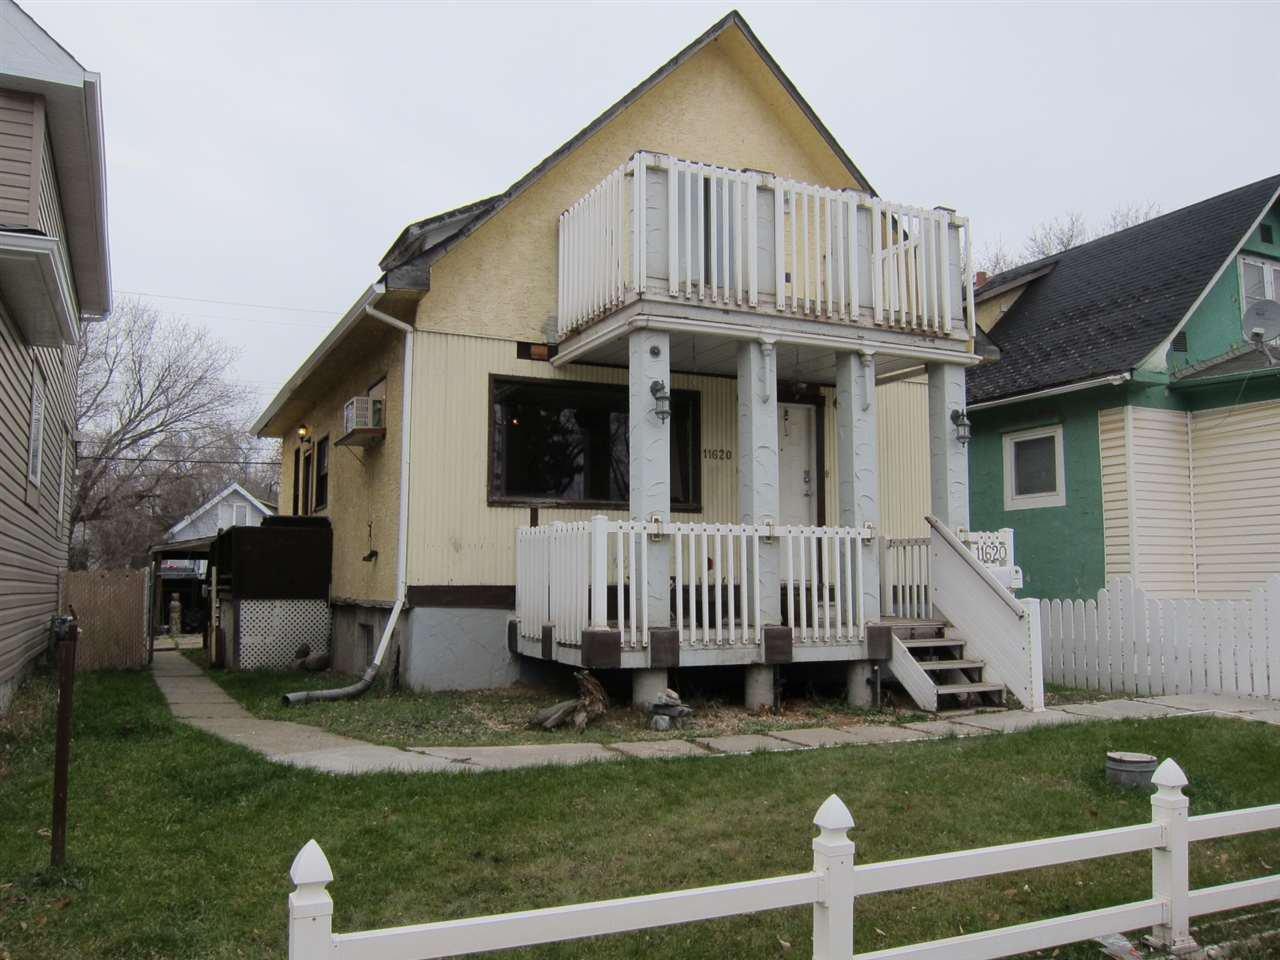 Main Photo: 11620 82 Street in Edmonton: Zone 05 House for sale : MLS®# E4179354